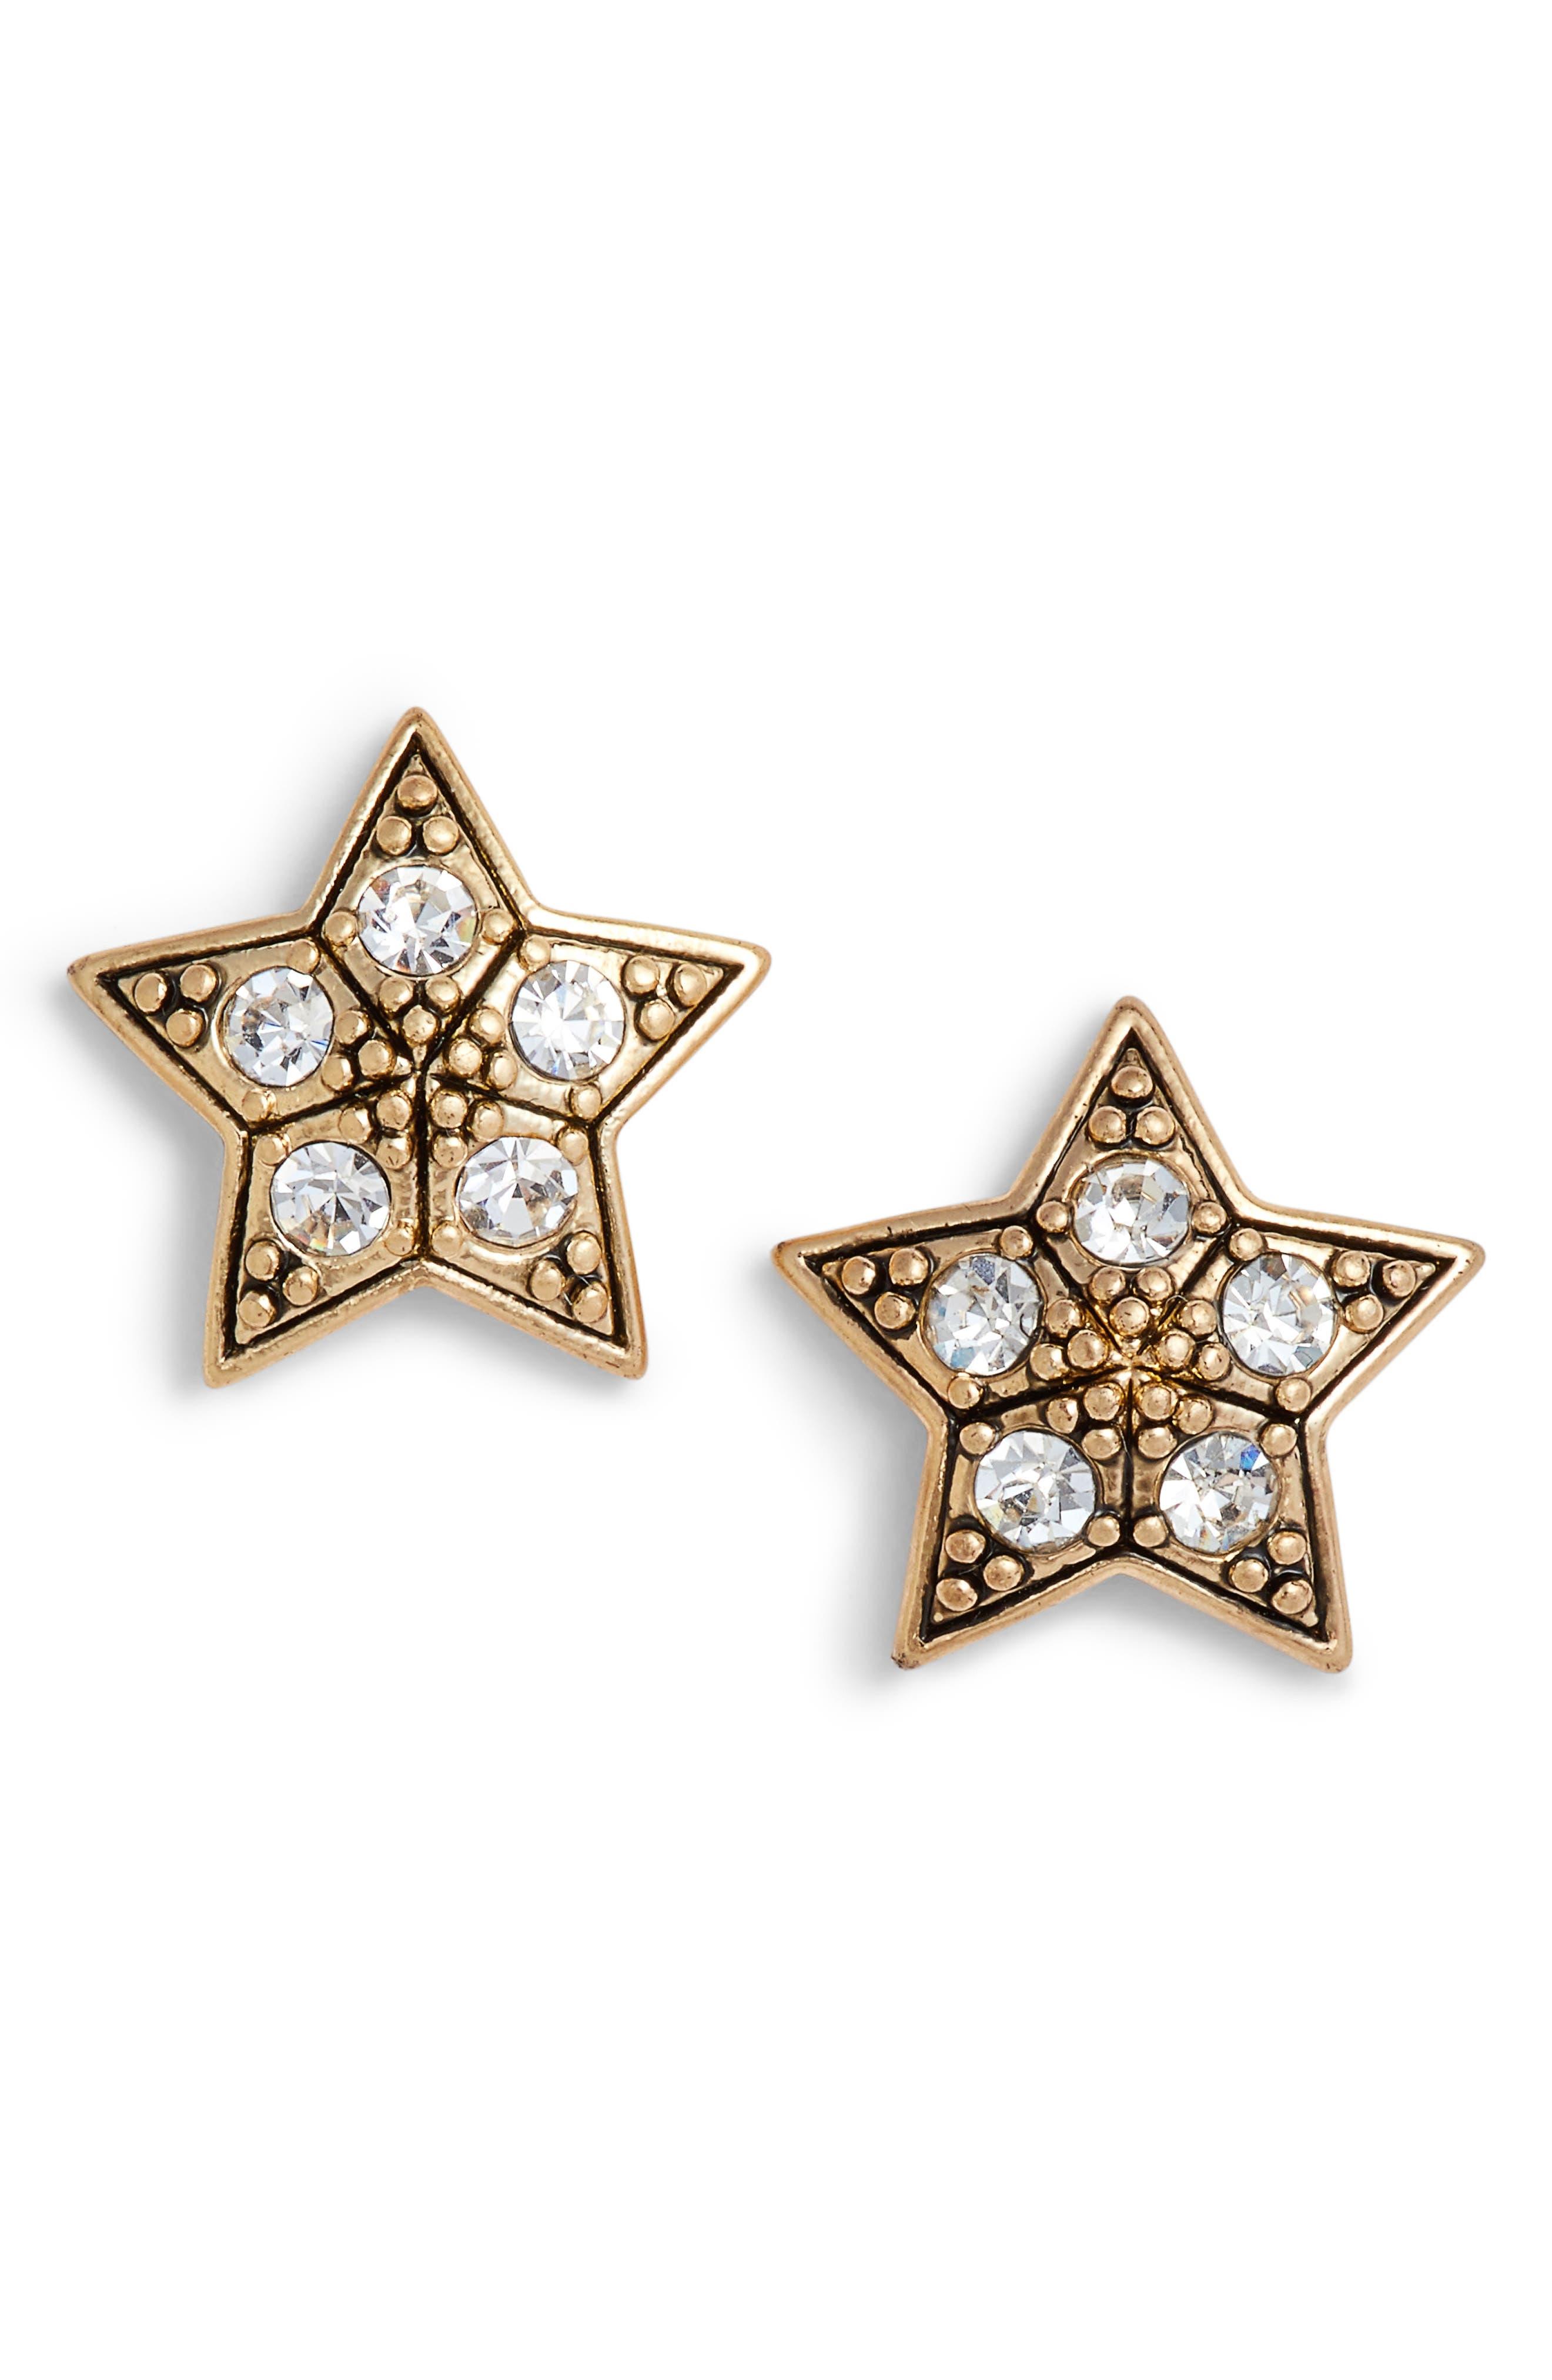 Star Stud Earrings,                         Main,                         color, Gold/ Crystal